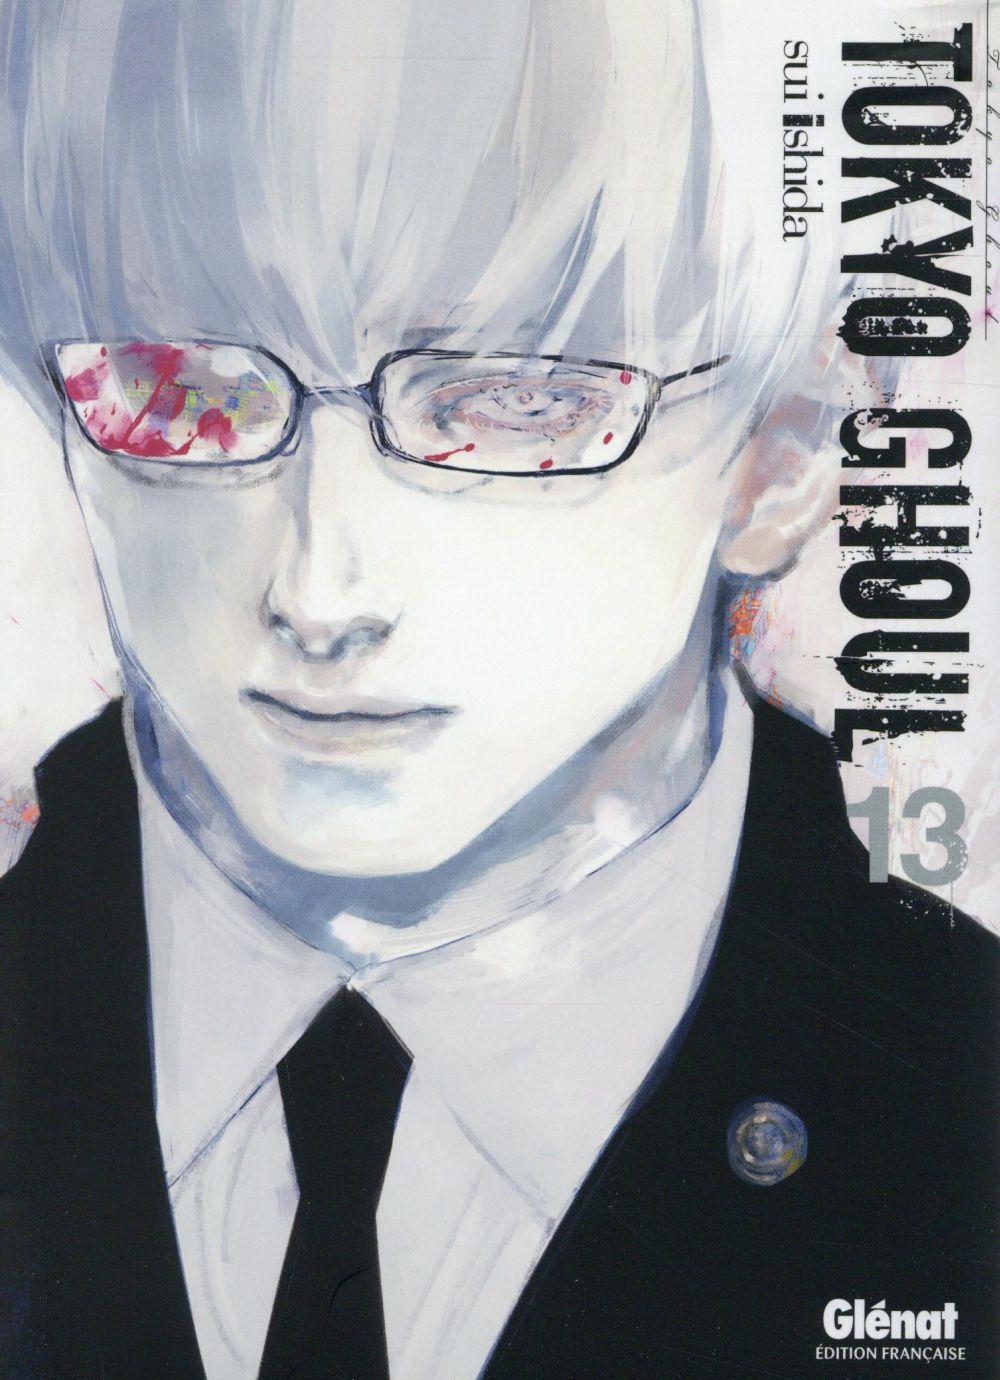 Tokyo ghoul t.13